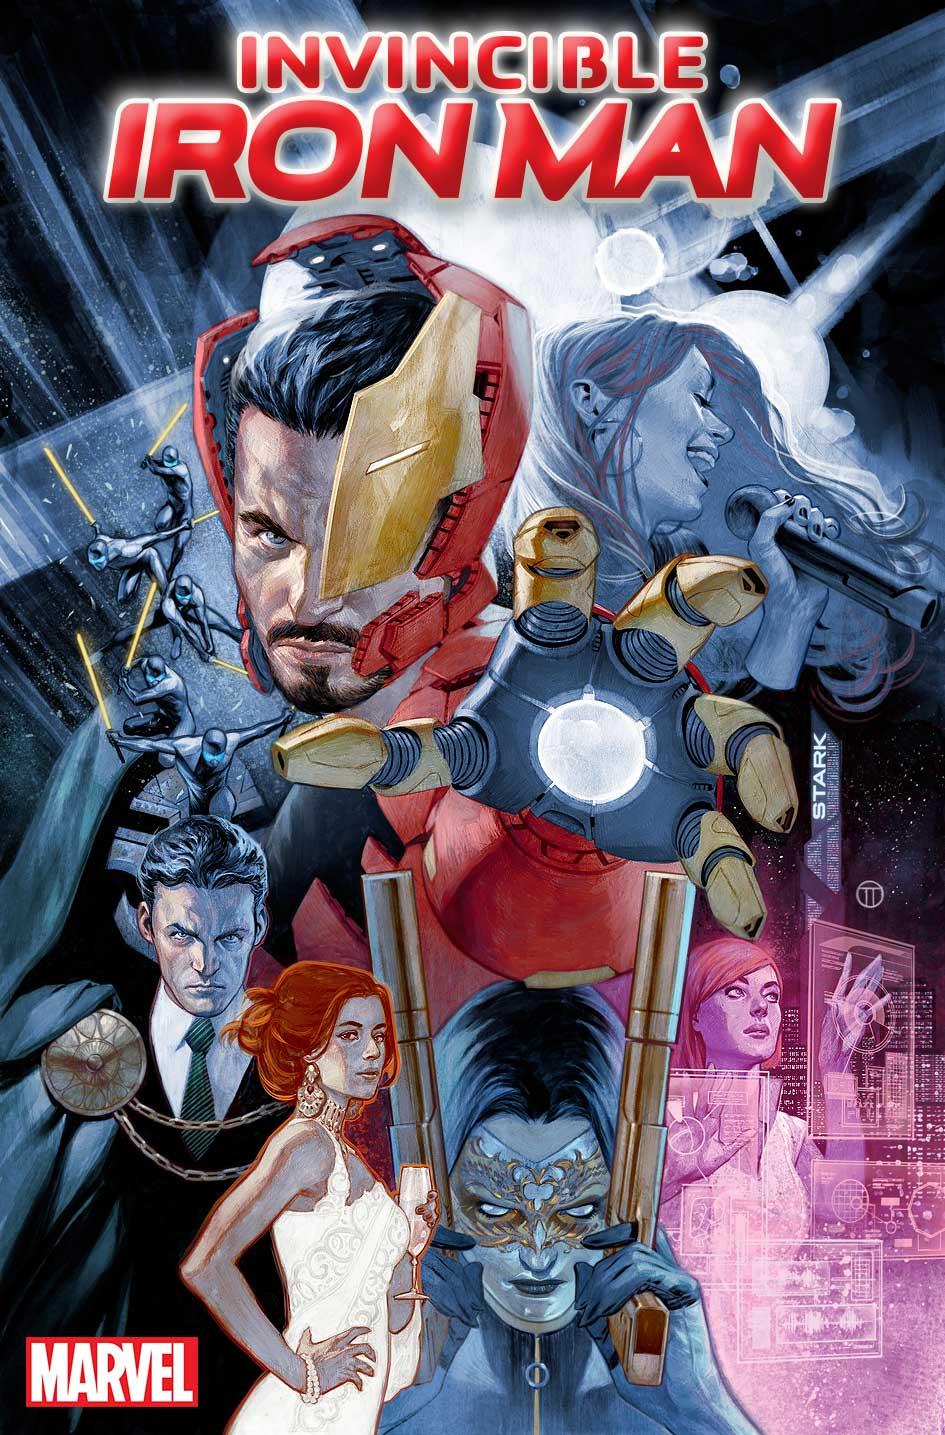 Marvel Reveals the STORY THUS FAR!